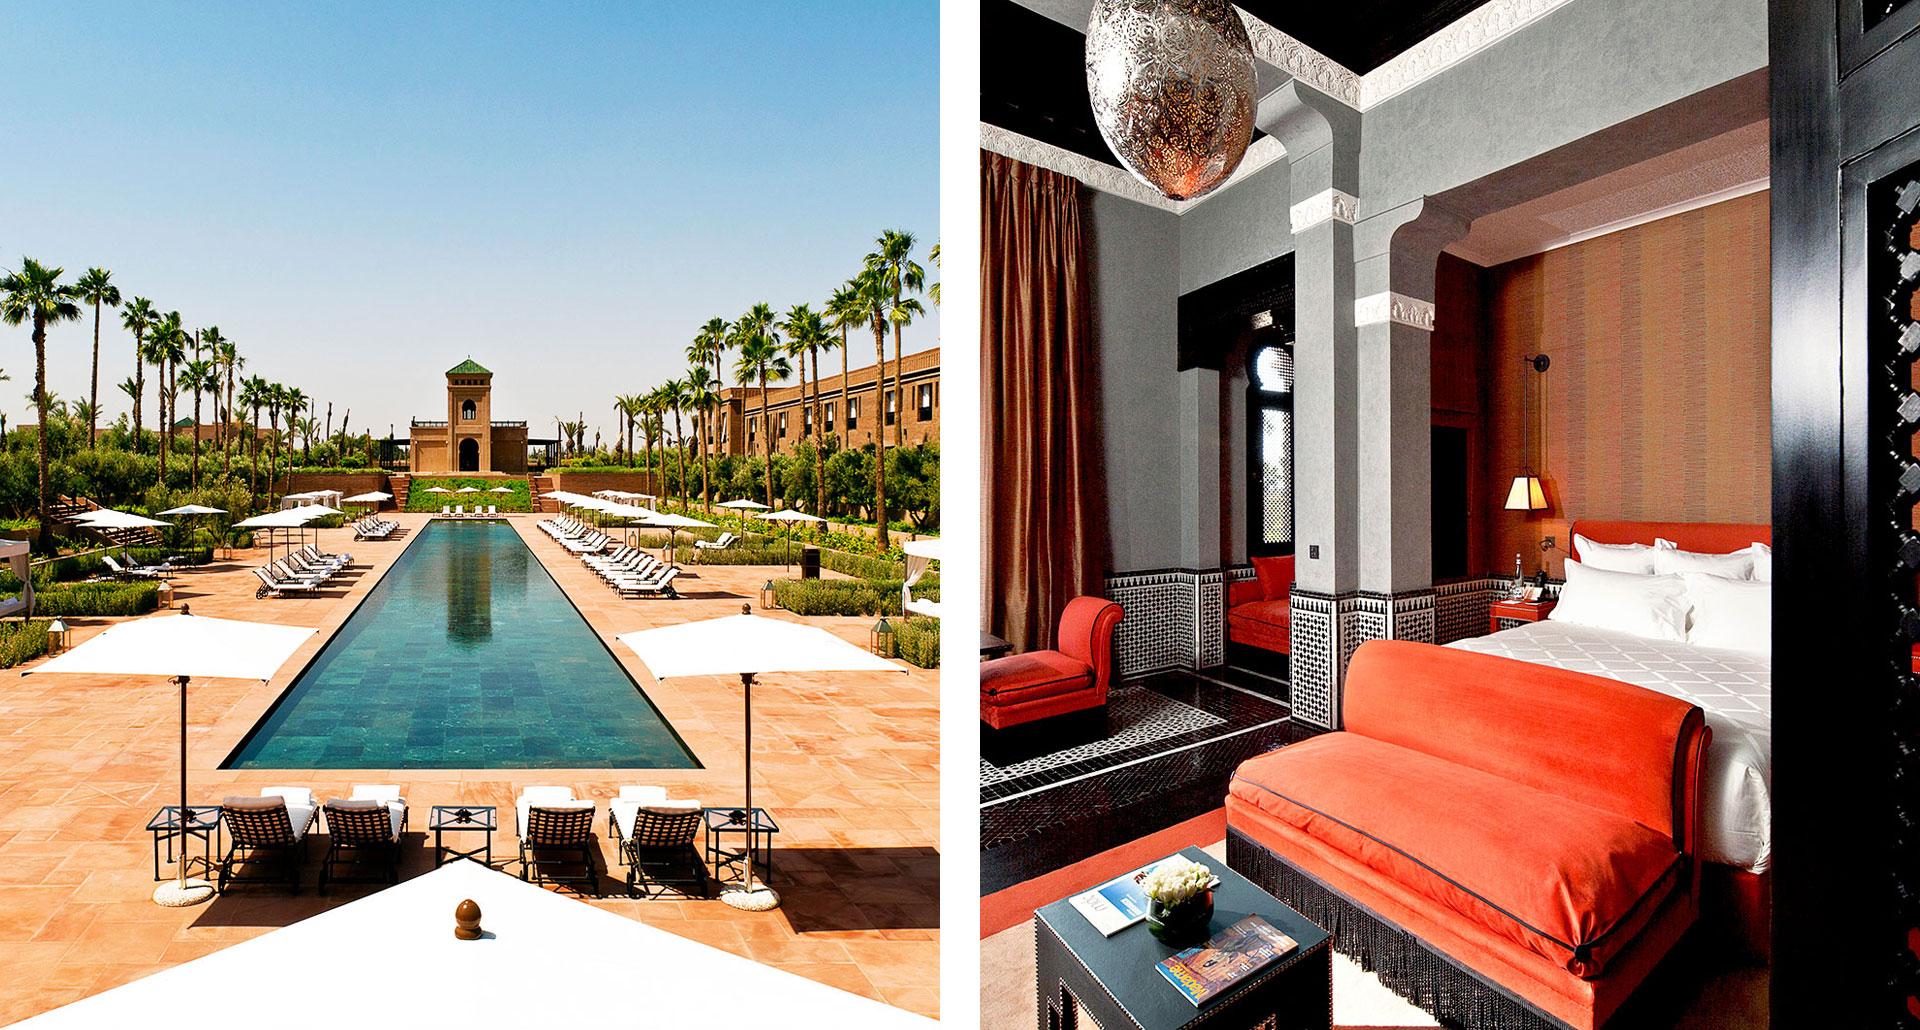 Selman Marrakech - boutique hotel in Marrakech